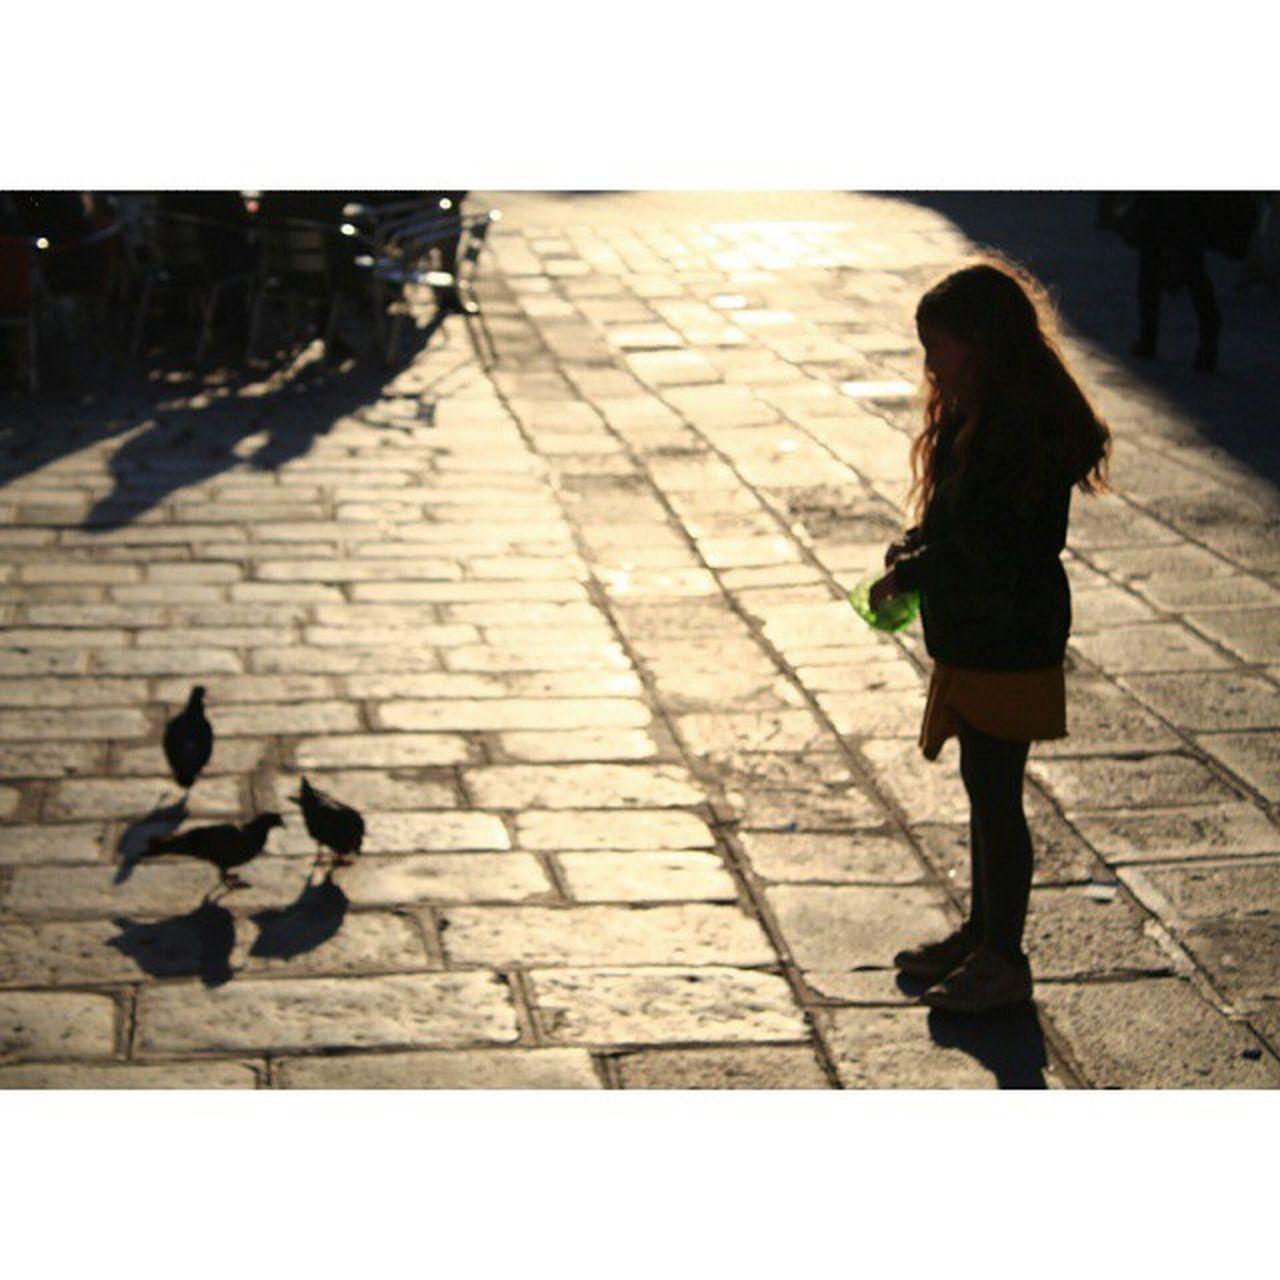 💫✨🌞Into the Light 🌞✨💫 🍃FourGardensOneCommunity - GiardiniVeneziani instameet🍃 | ✨ Instatellers ✨ | NoFilter Taken with 📷 Canon EOS 1100D | IG_Venice IG_Veneto IG_Italy IG_Europe IG_WorldClub IG_Exquisite IG_Masterpiece Gununkaresi VisitVeneto Venice Veniceporn Controluce girl chasinglight BrowsingItaly Foto_Italiane NumberOf1 InstagramHub 2InstaGood AllShots_ ShotWithLove Big_Shotz Gunukaresi